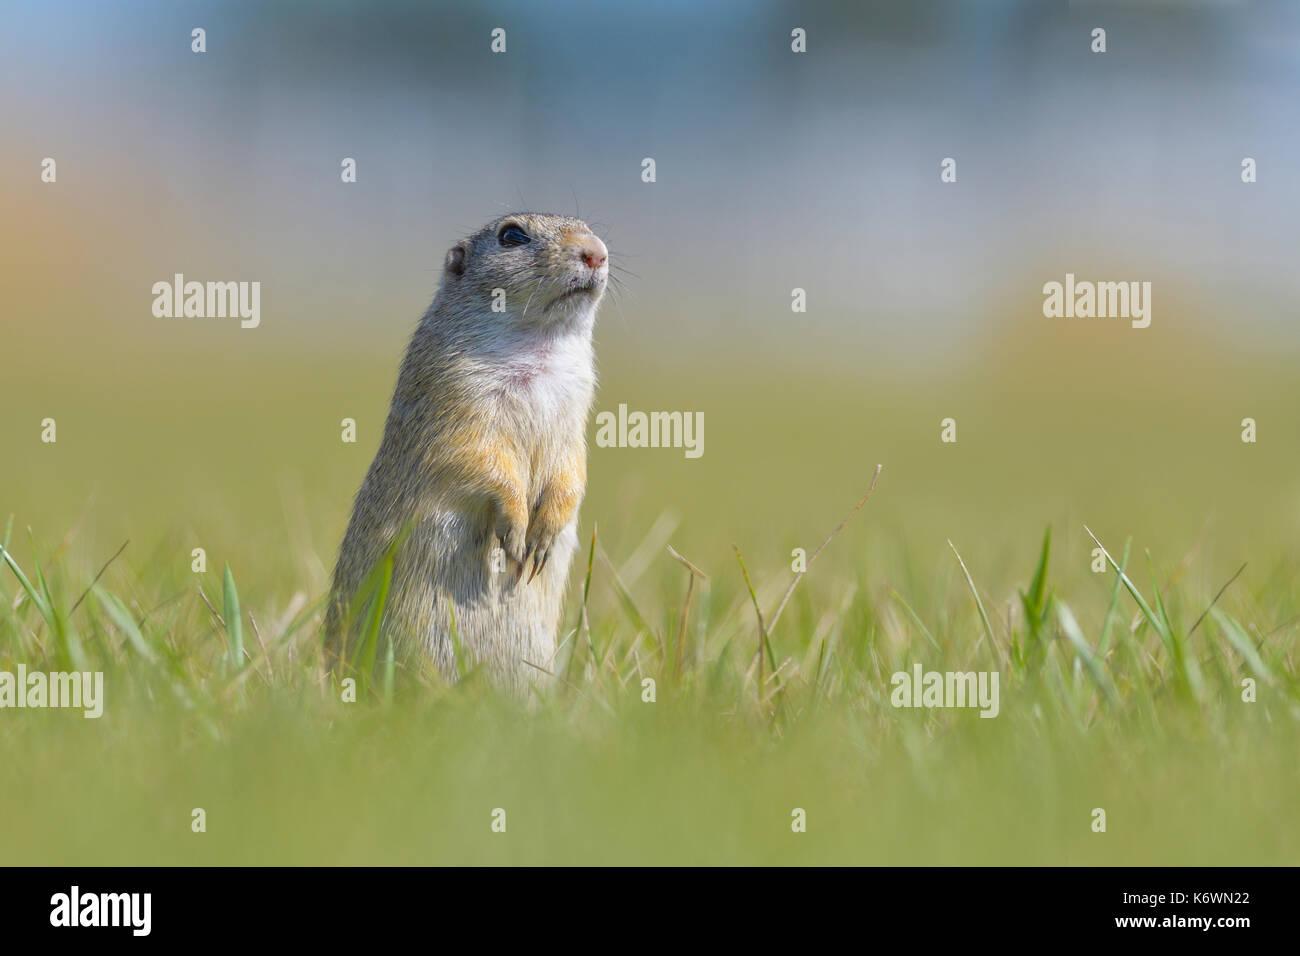 European ground squirrel (Spermophilus citellus), standing in meadow, Vienna area, Austria Stock Photo